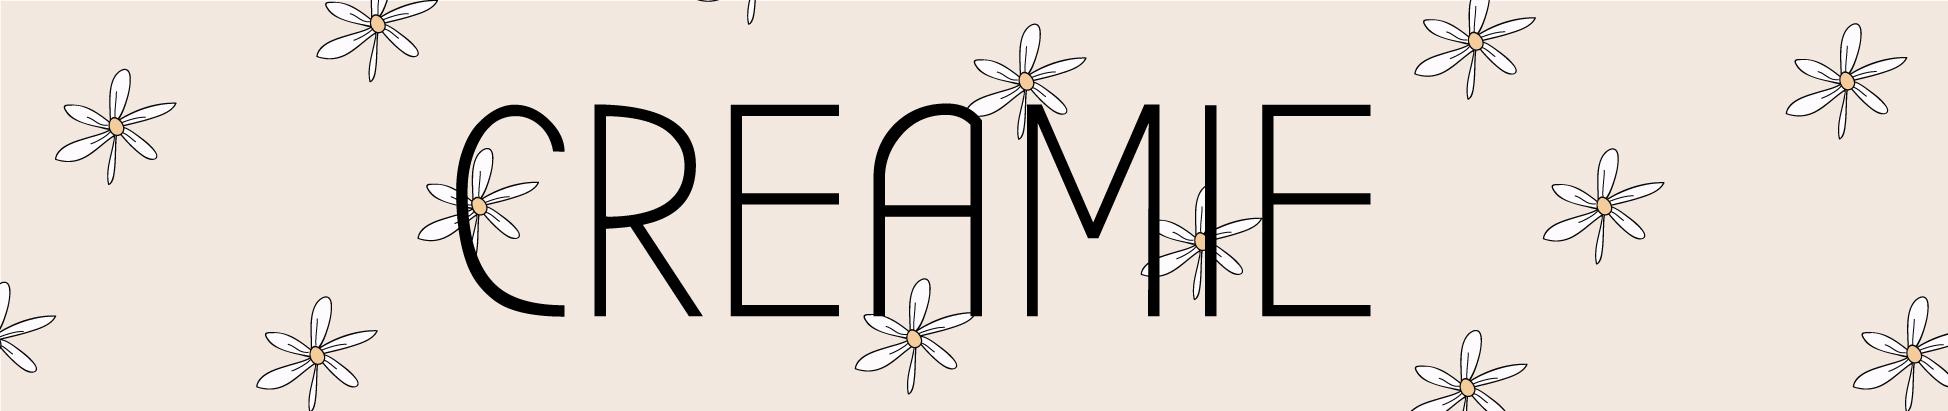 creamie-ss20-banner-cream.jpg